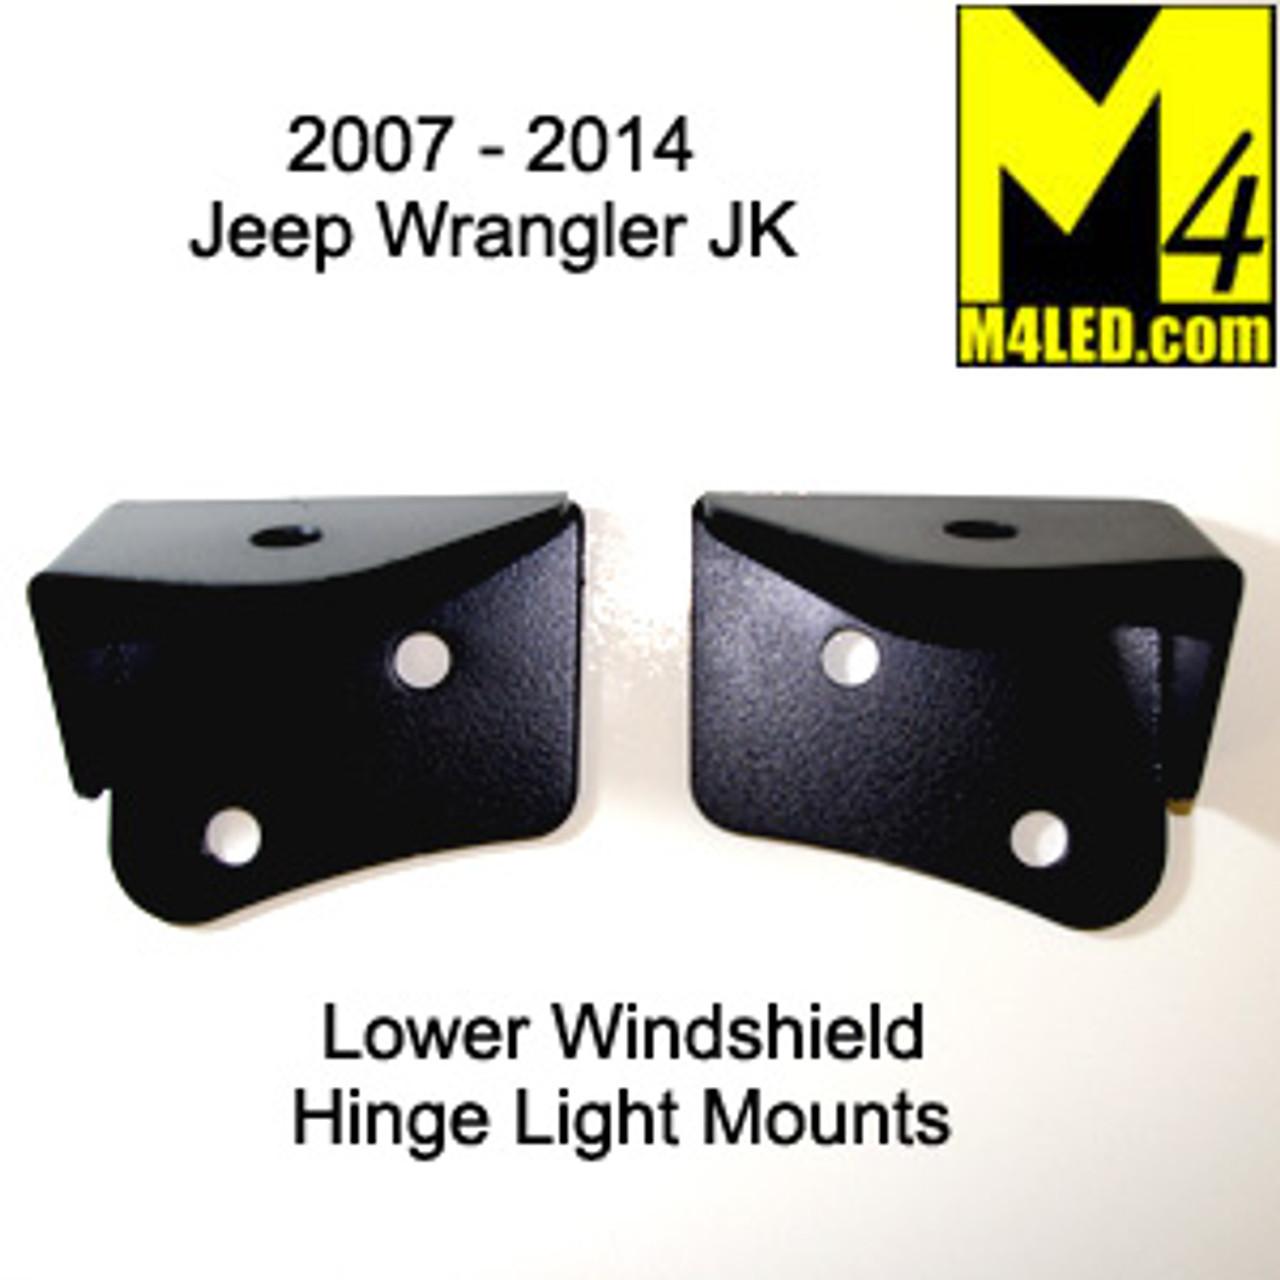 DOORBUSTER 50% Off - Jeep Wrangler JK Lower Windshield Light Mounts